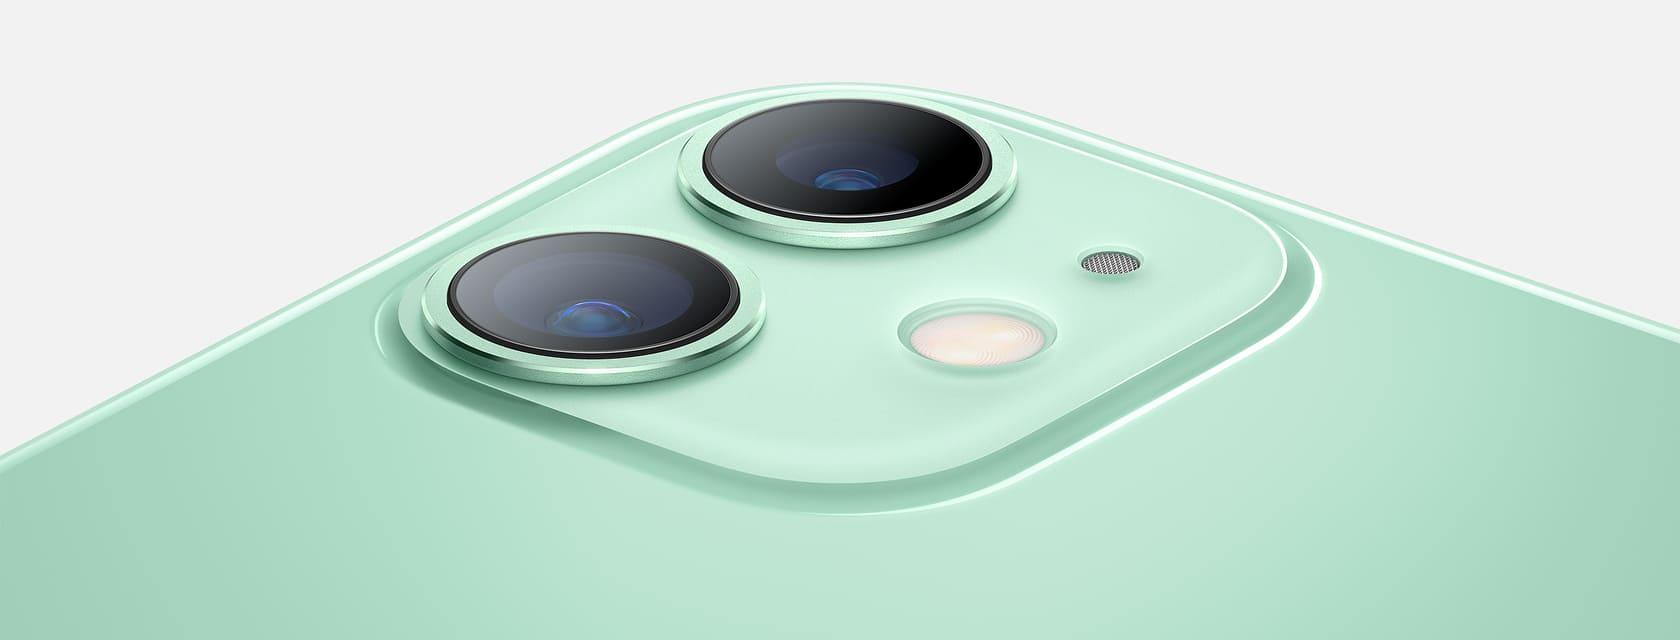 iphone11 камера